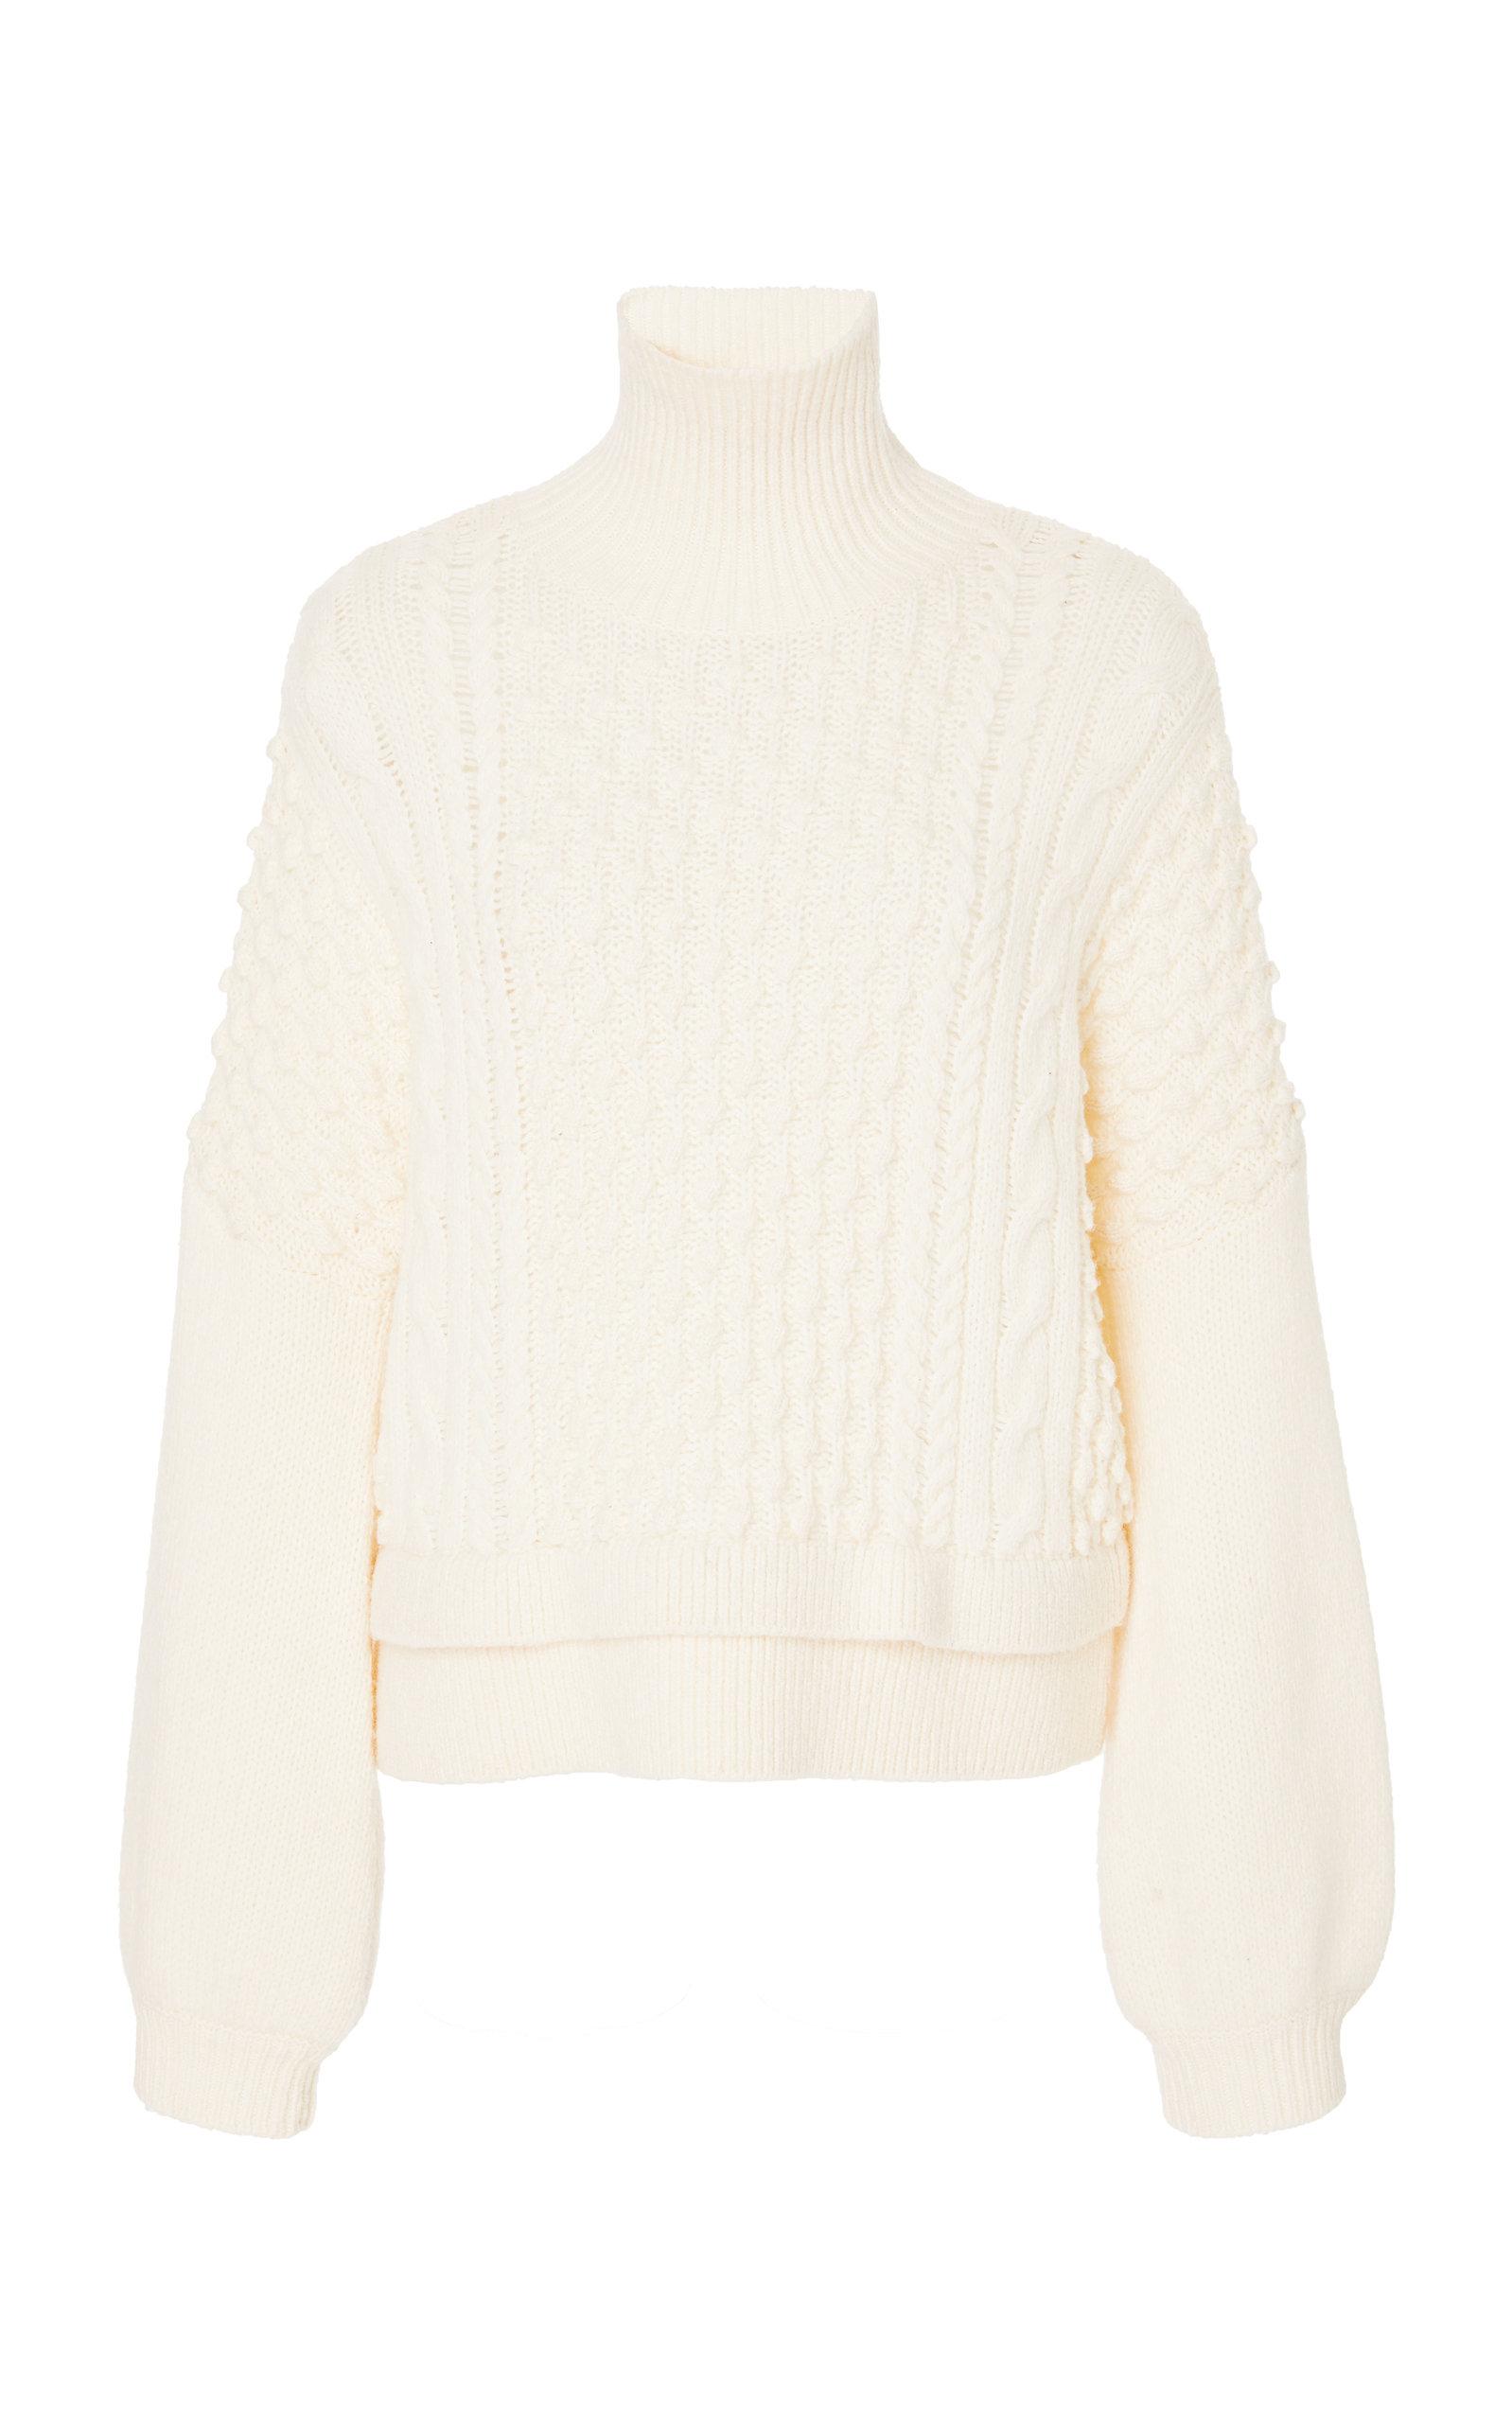 Nubby Turtleneck Wool-Blend Knit Sweater, White